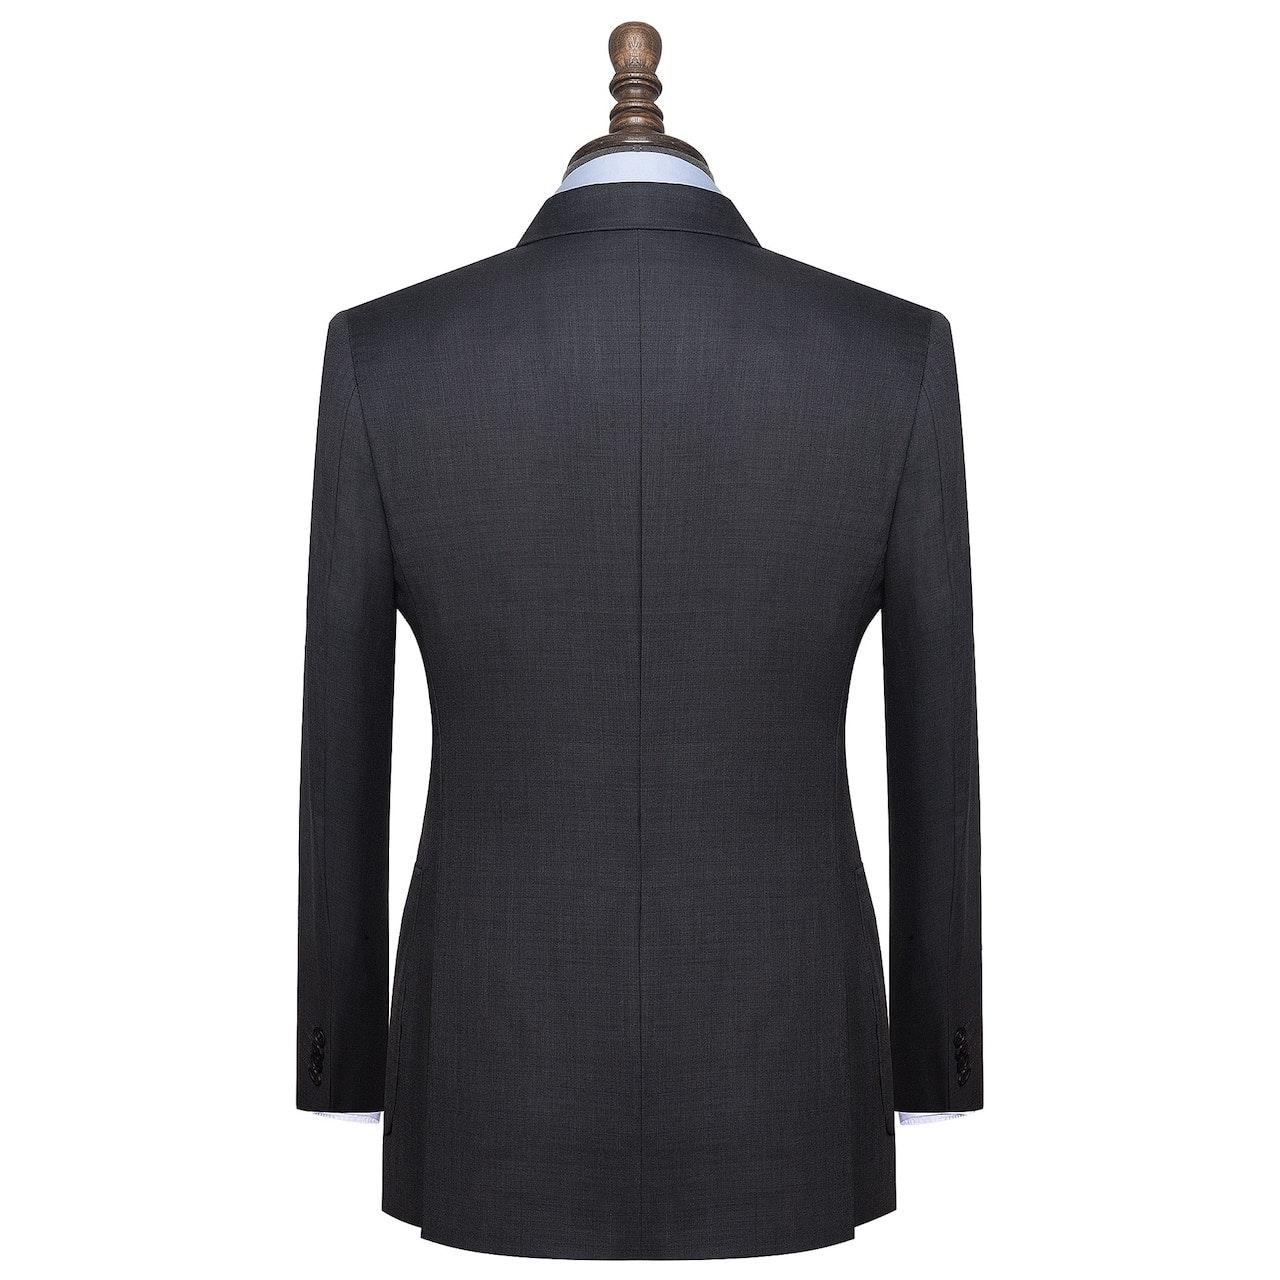 InStitchu Suit Fabric 34